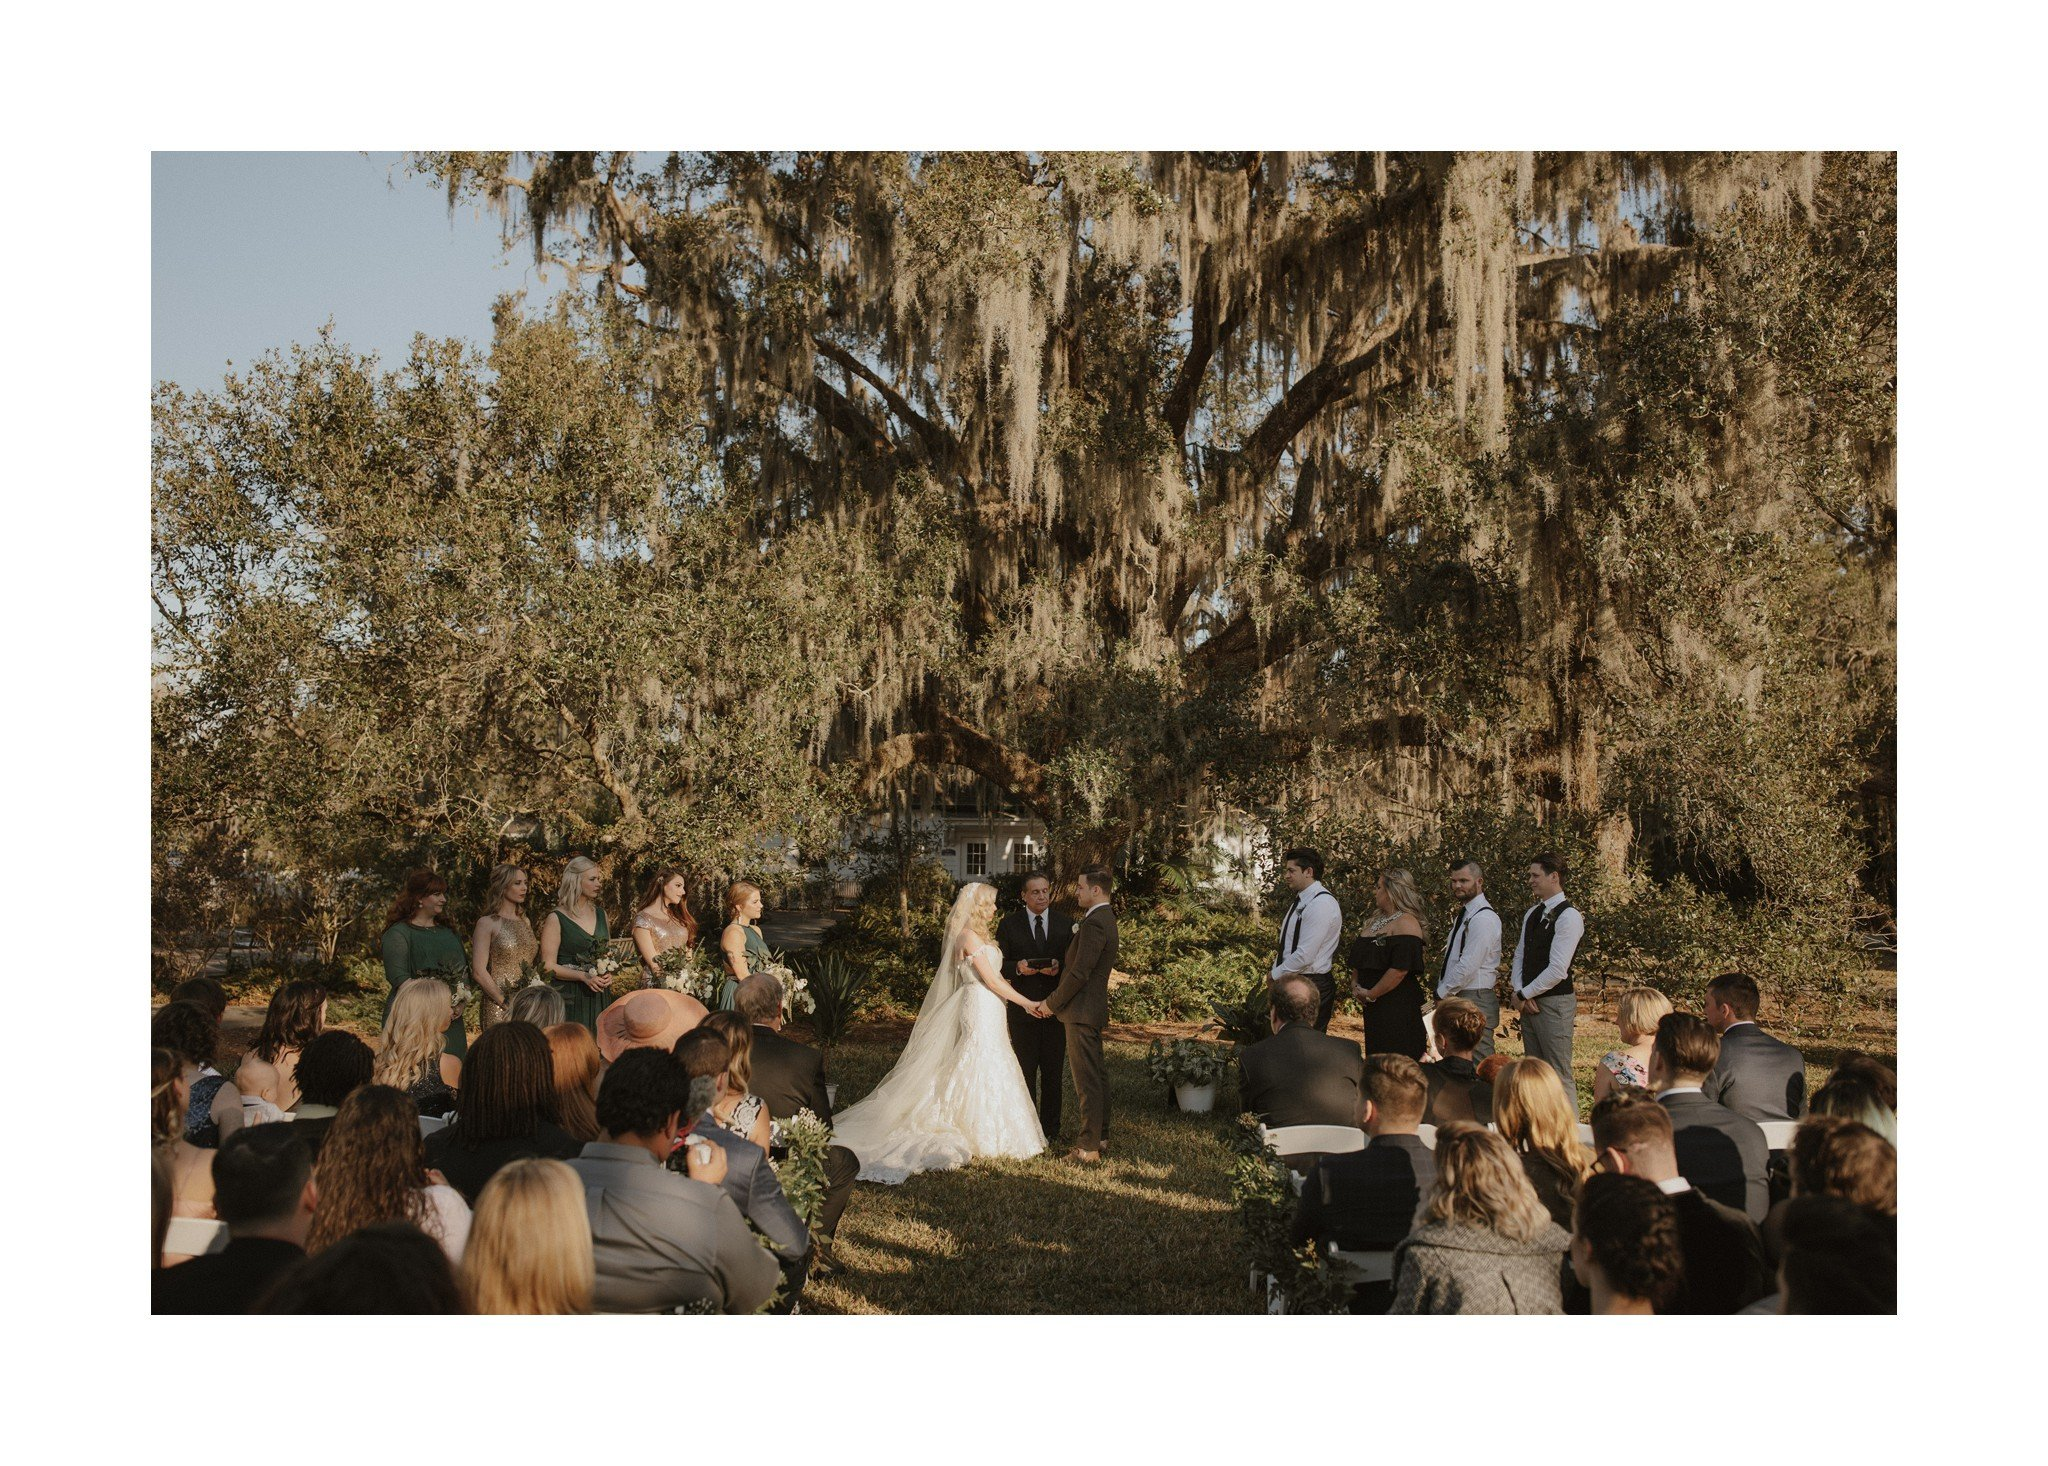 KRISTEN + LLOYD // Winter Park, Florida - Joshua Kane Photography